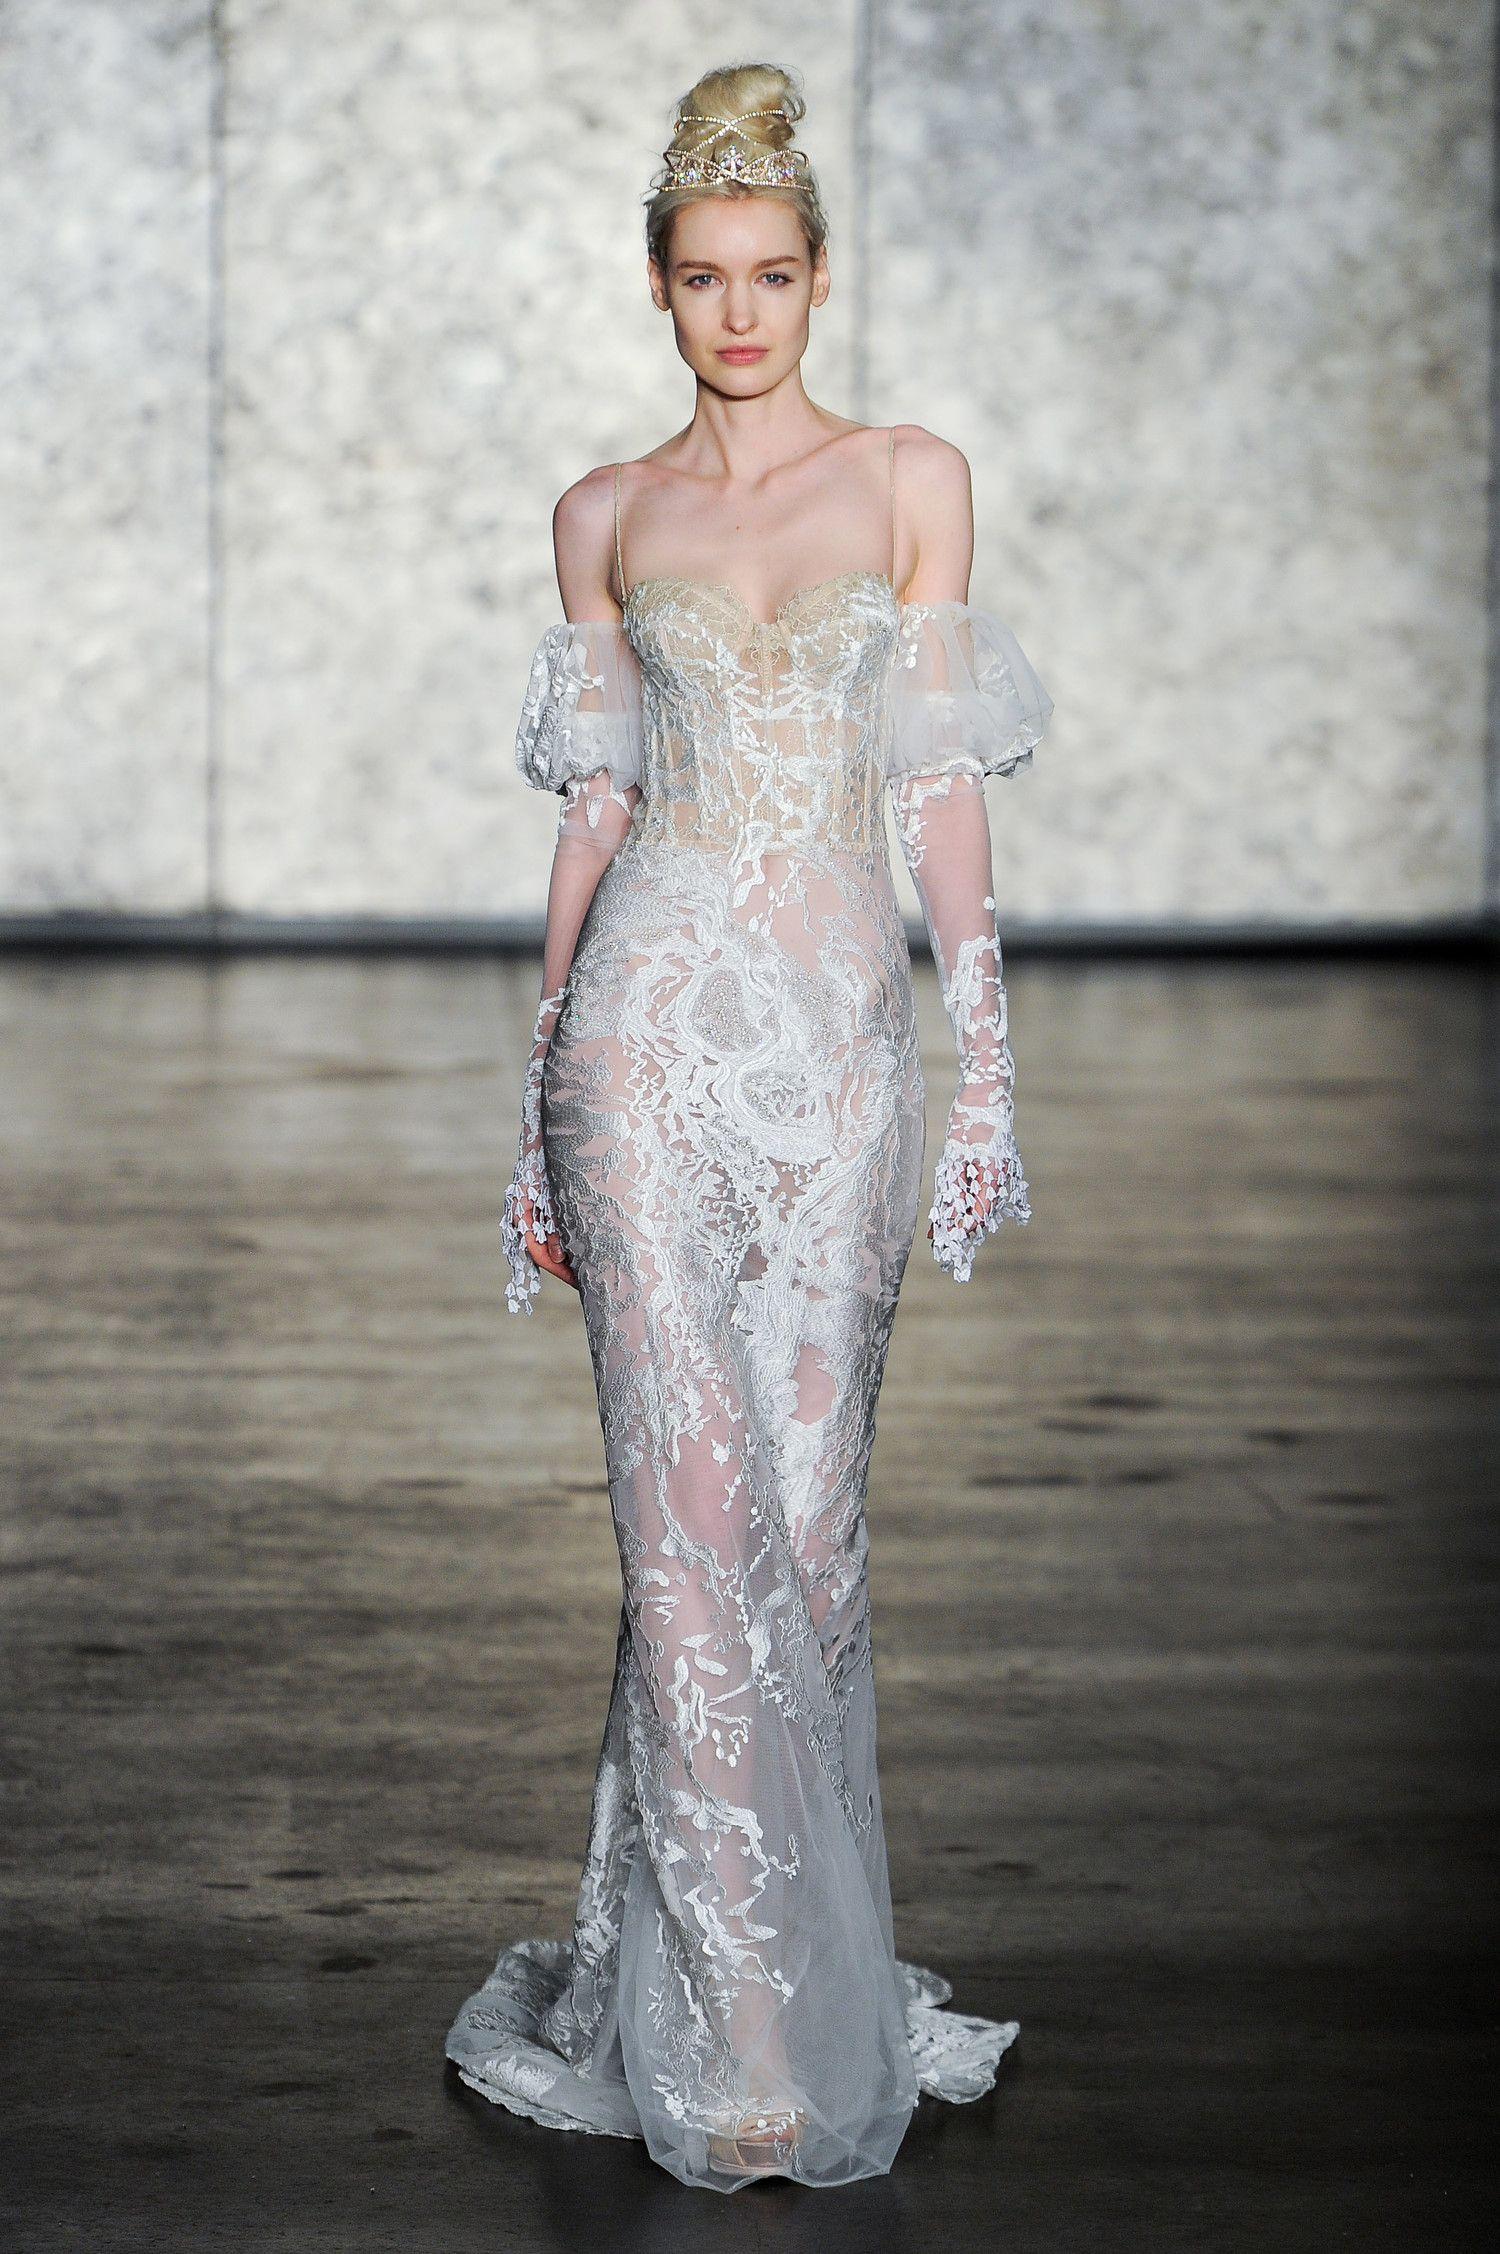 Cold-shoulder sheer wedding dress with bustier top | bridal ...